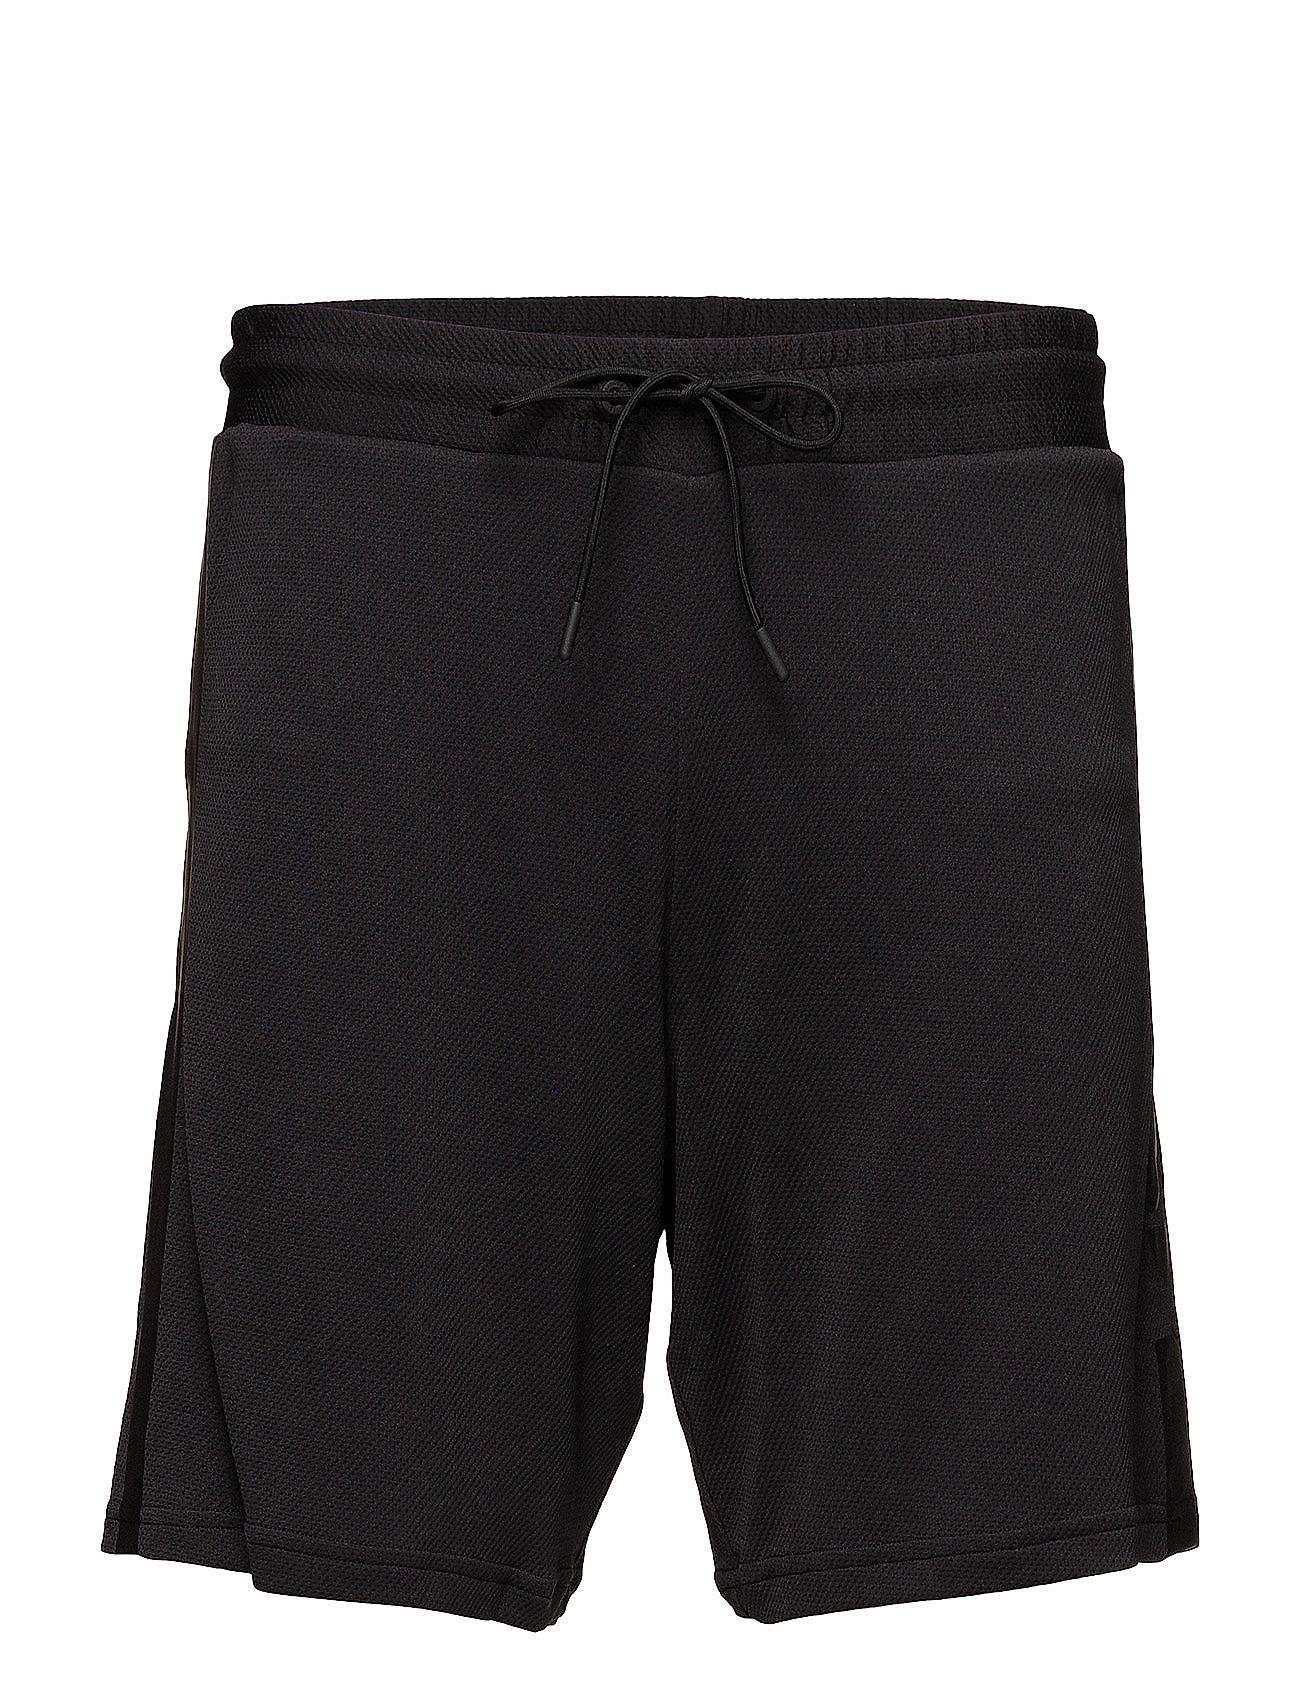 928a4b9867 M Dexter Double Mesh (Black) (£42) - J. Lindeberg - Bottoms   Boozt.com